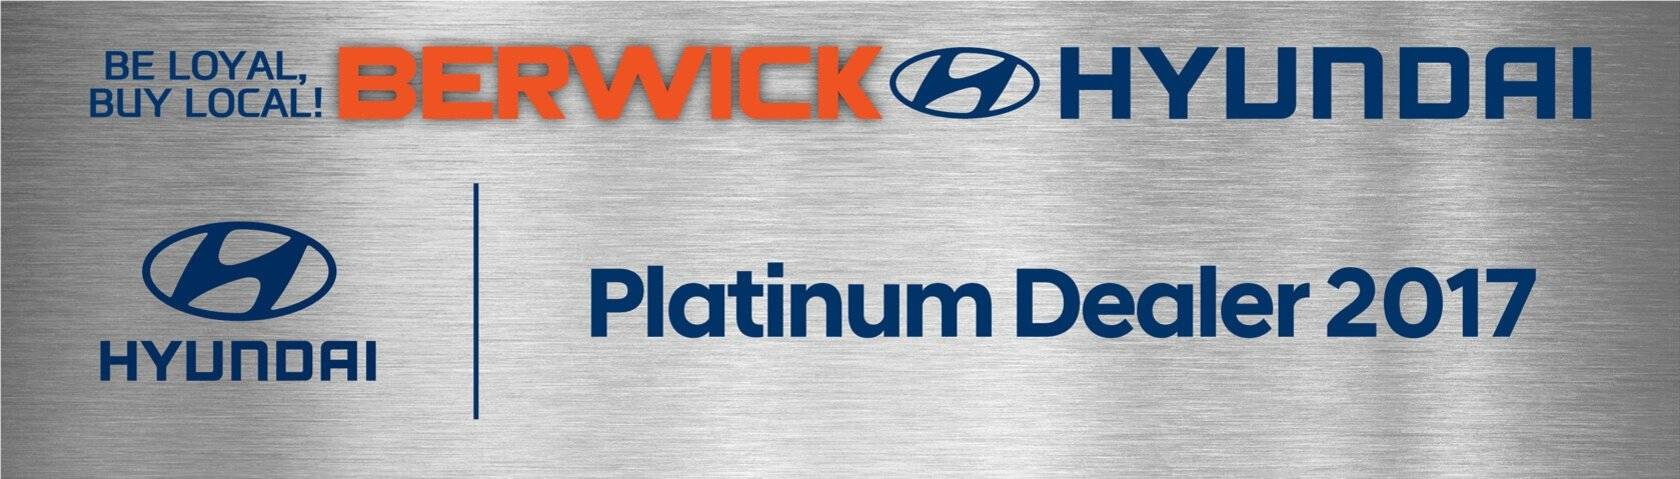 Berwick Hyundai Platinum Dealer 2017